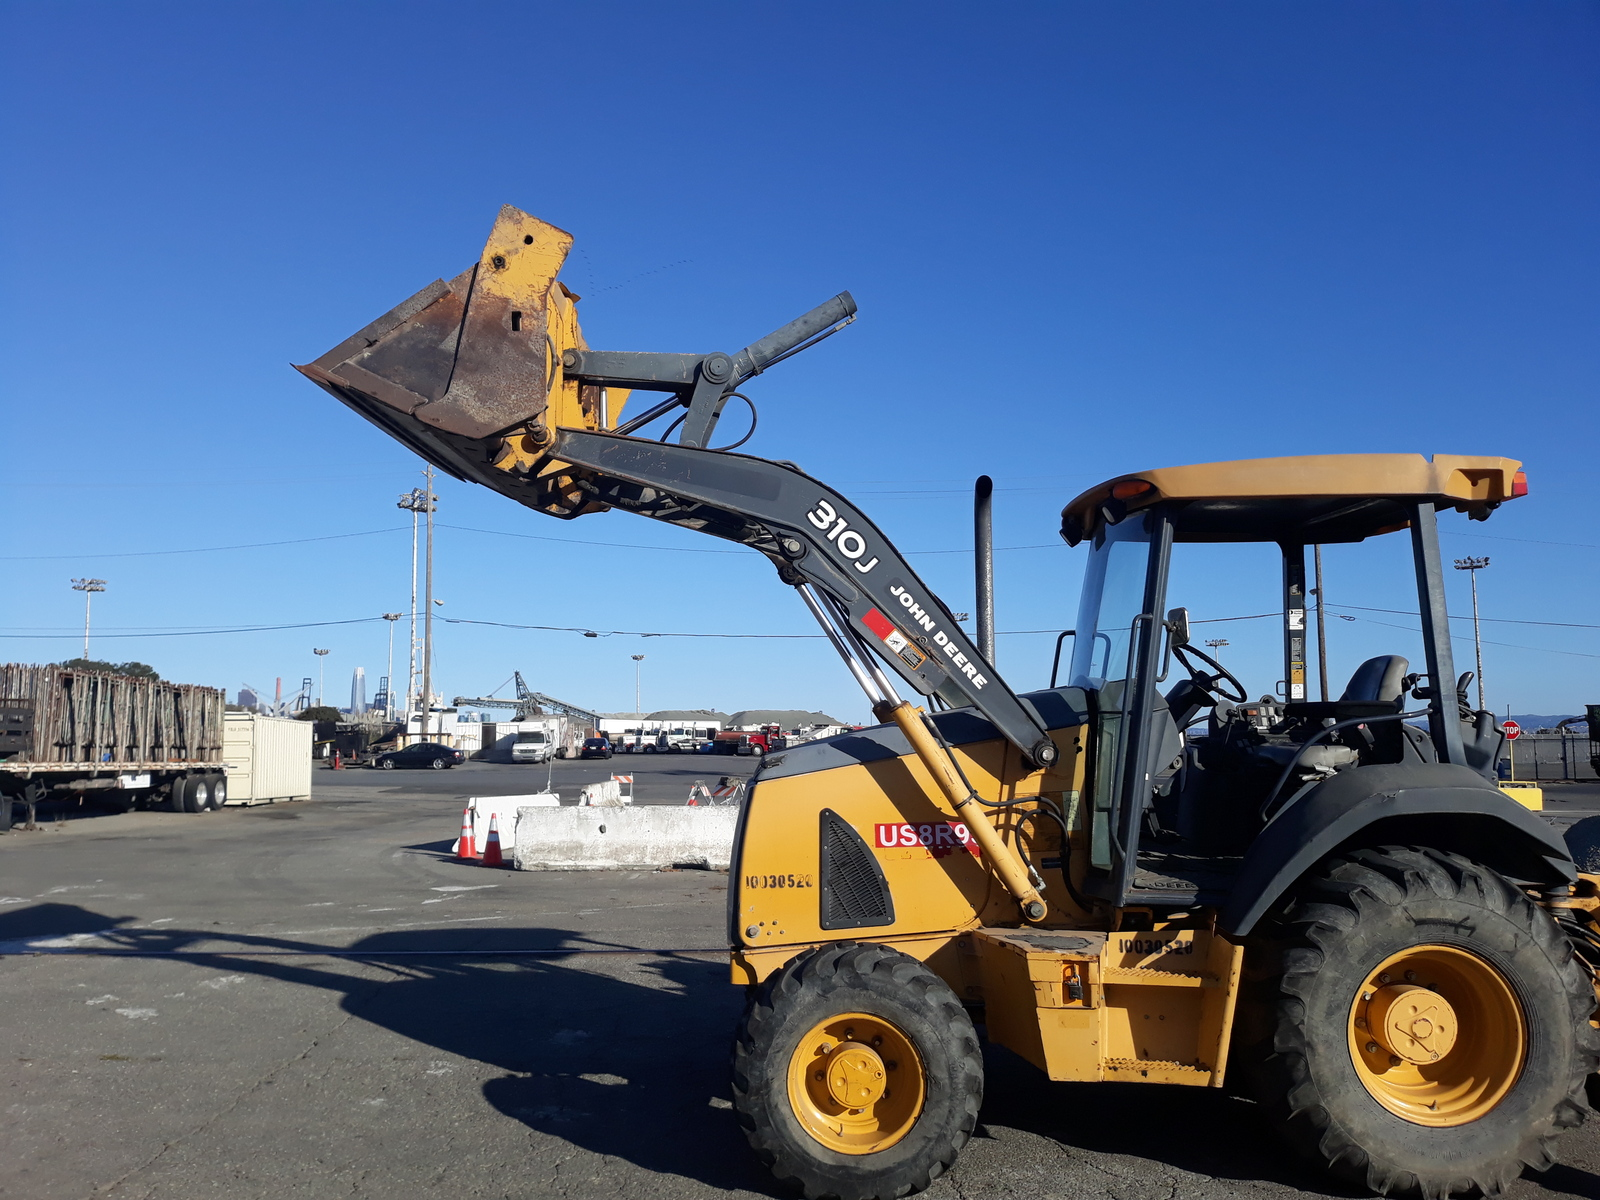 2012 JOHN DEERE 310J FOR SALE IN NOVATO, CA 94947